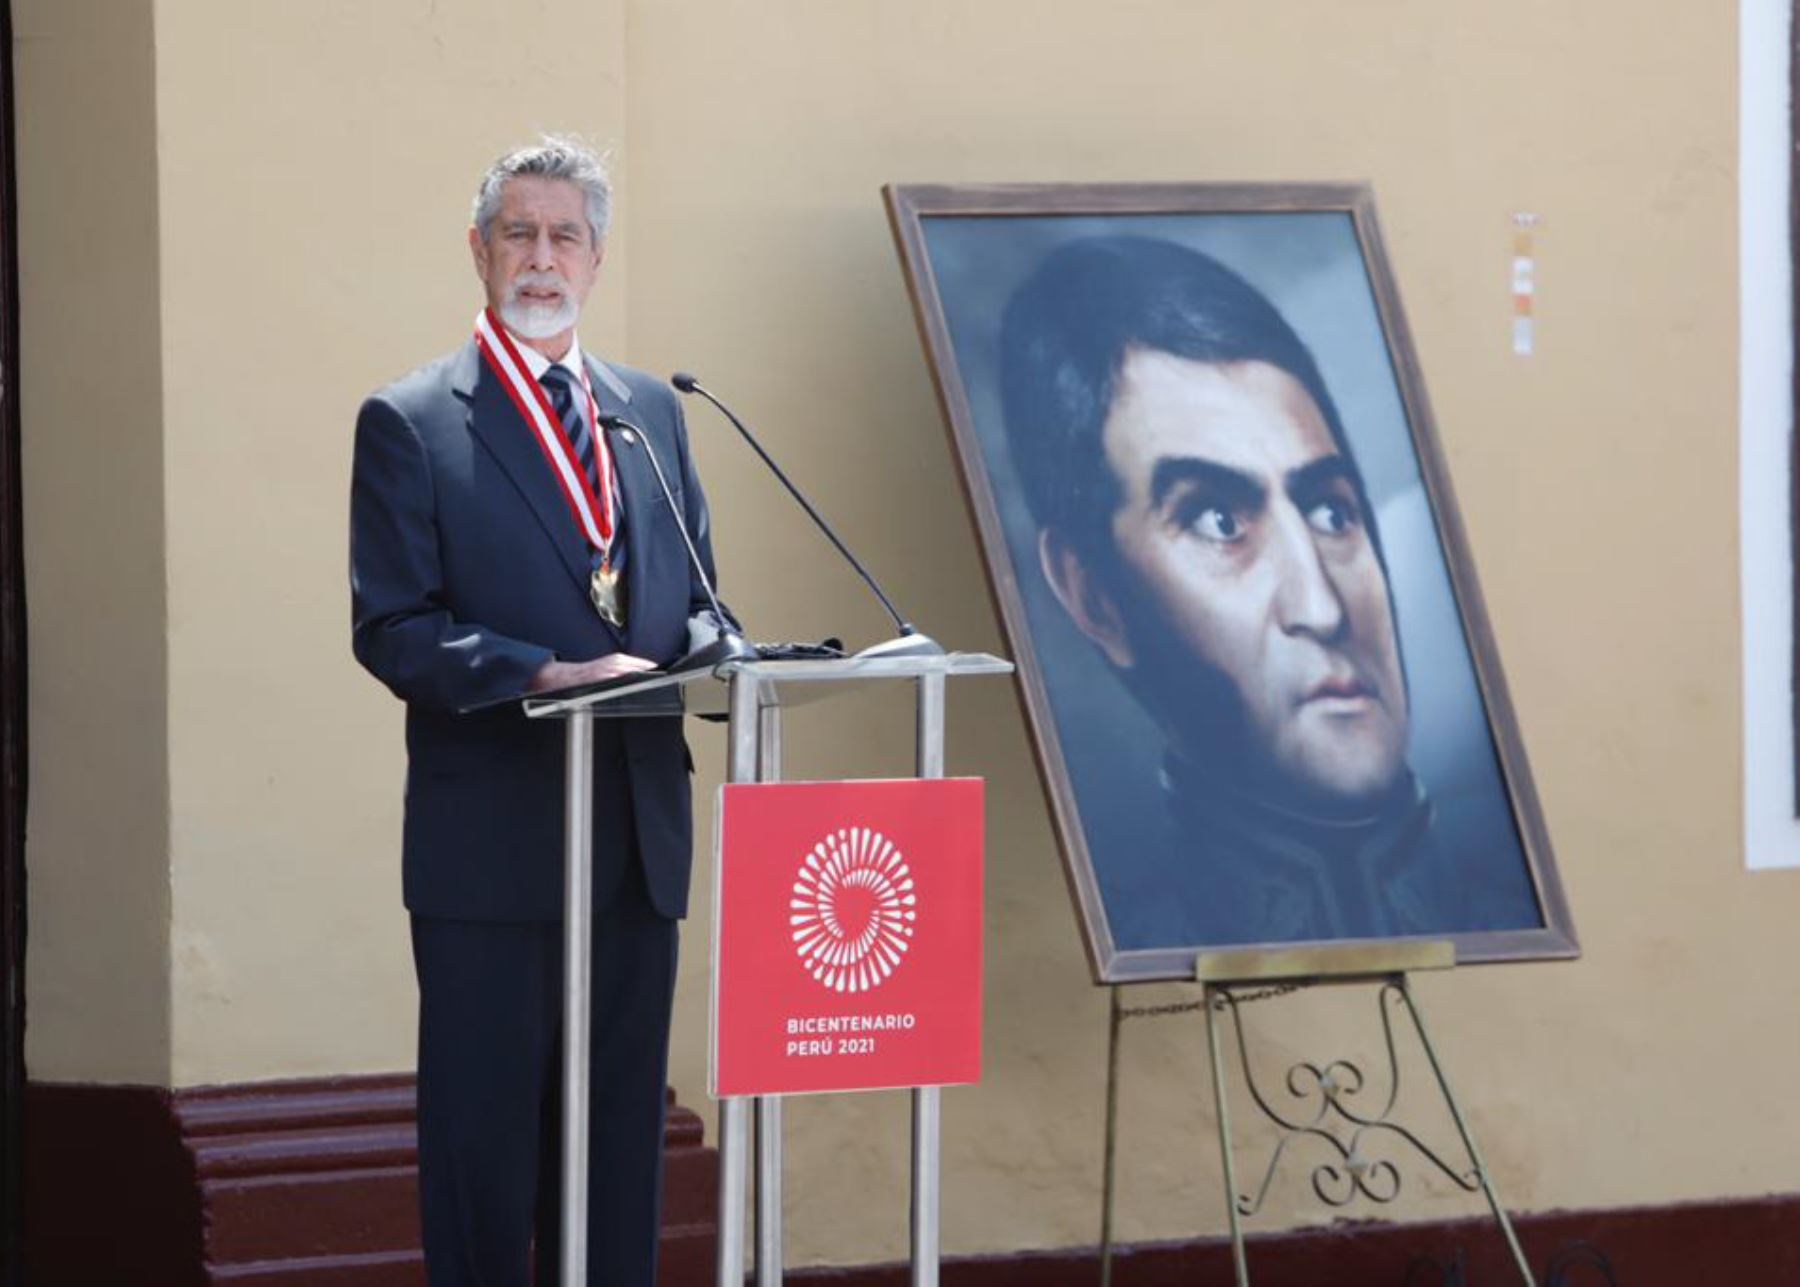 EN VIVO: Presidente Francisco Sagasti en Huaura